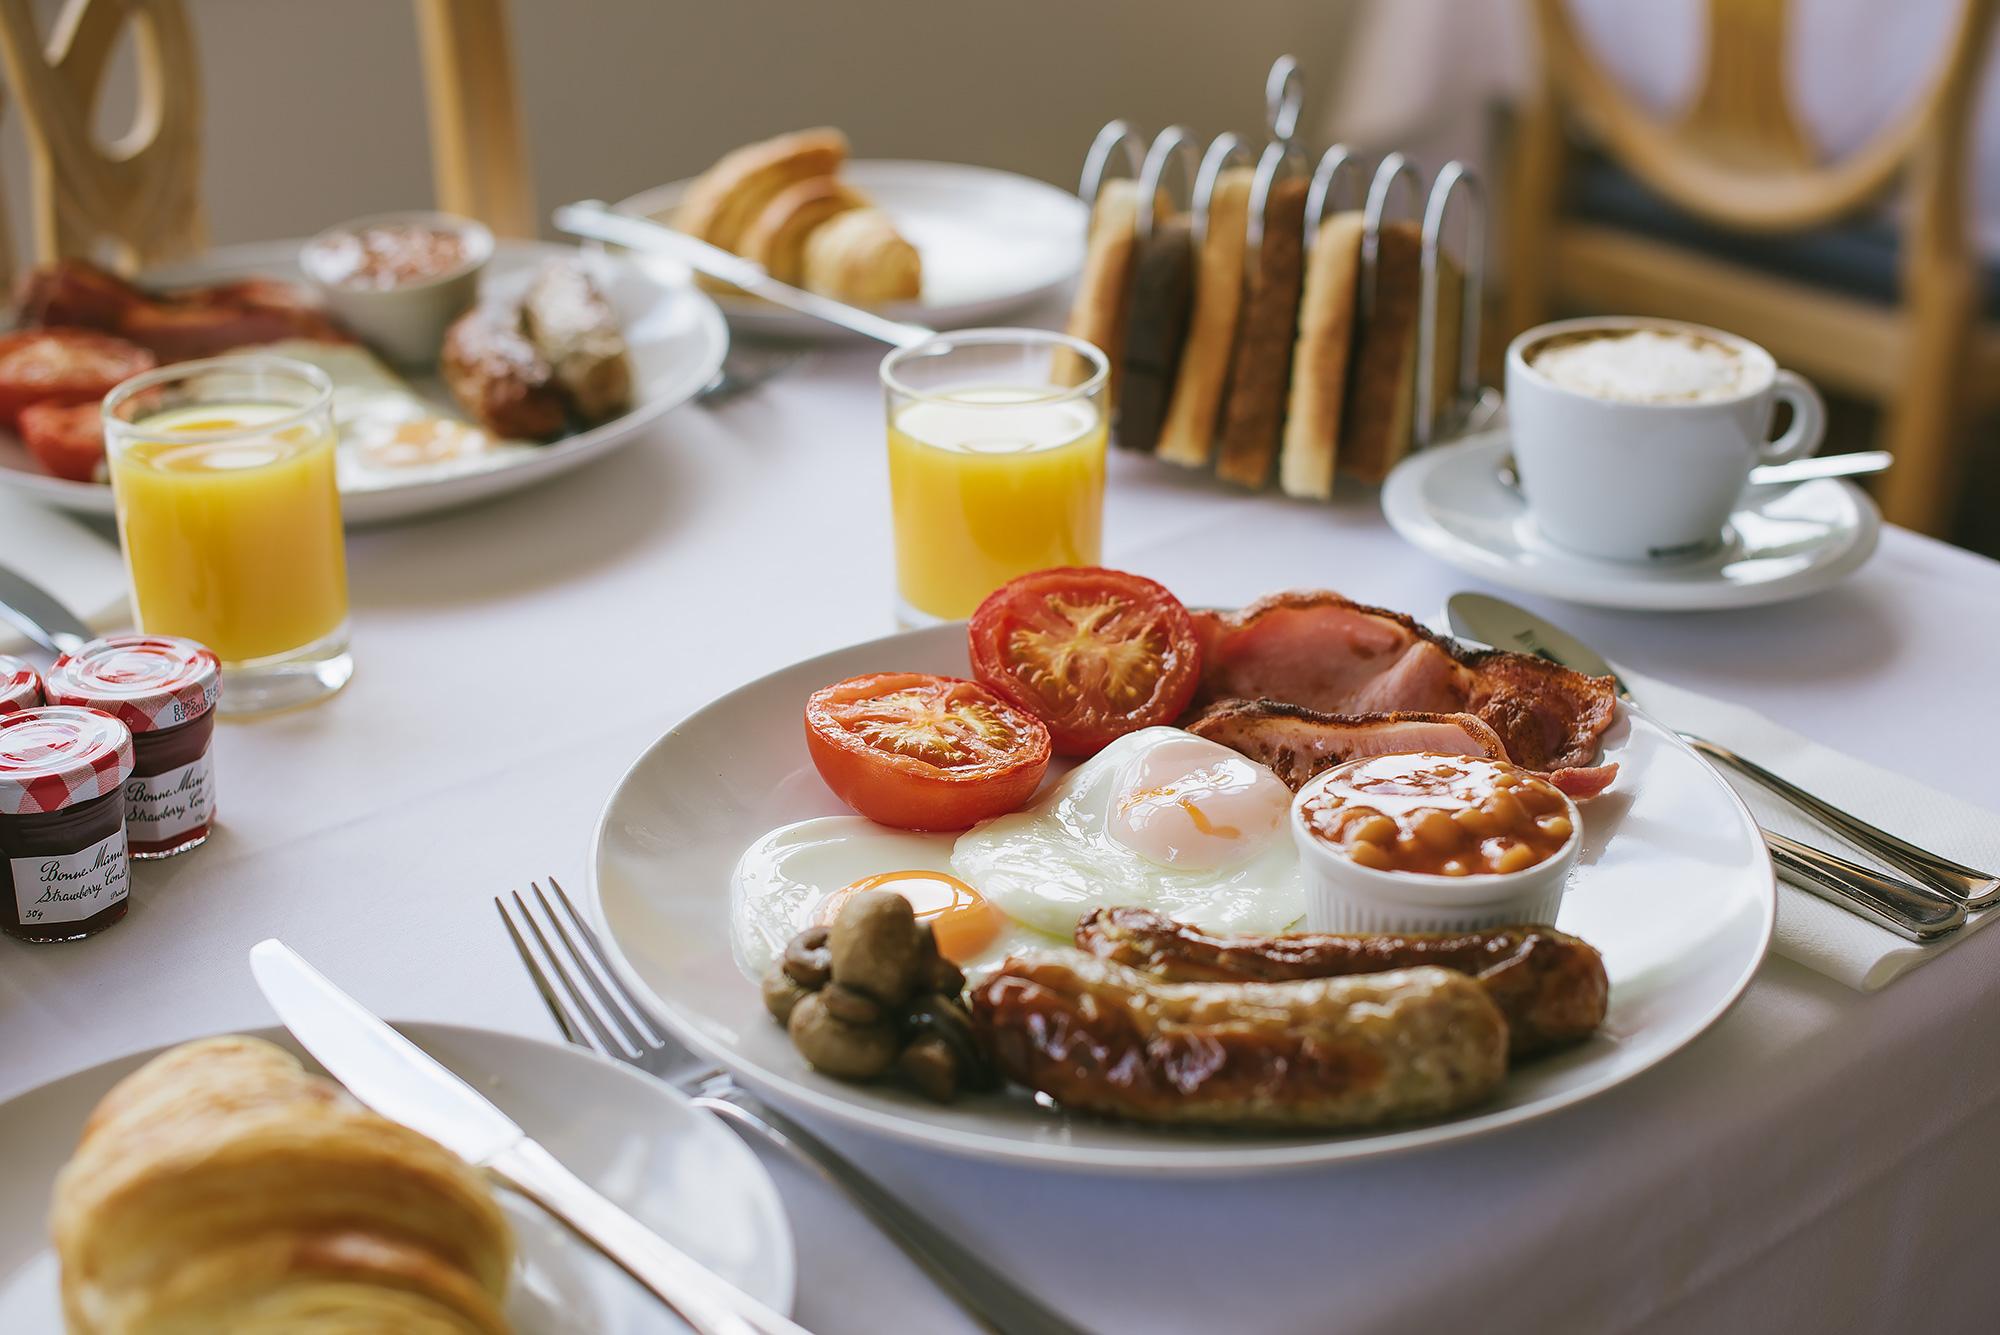 hotel-full-english-breakfast-photography.jpg